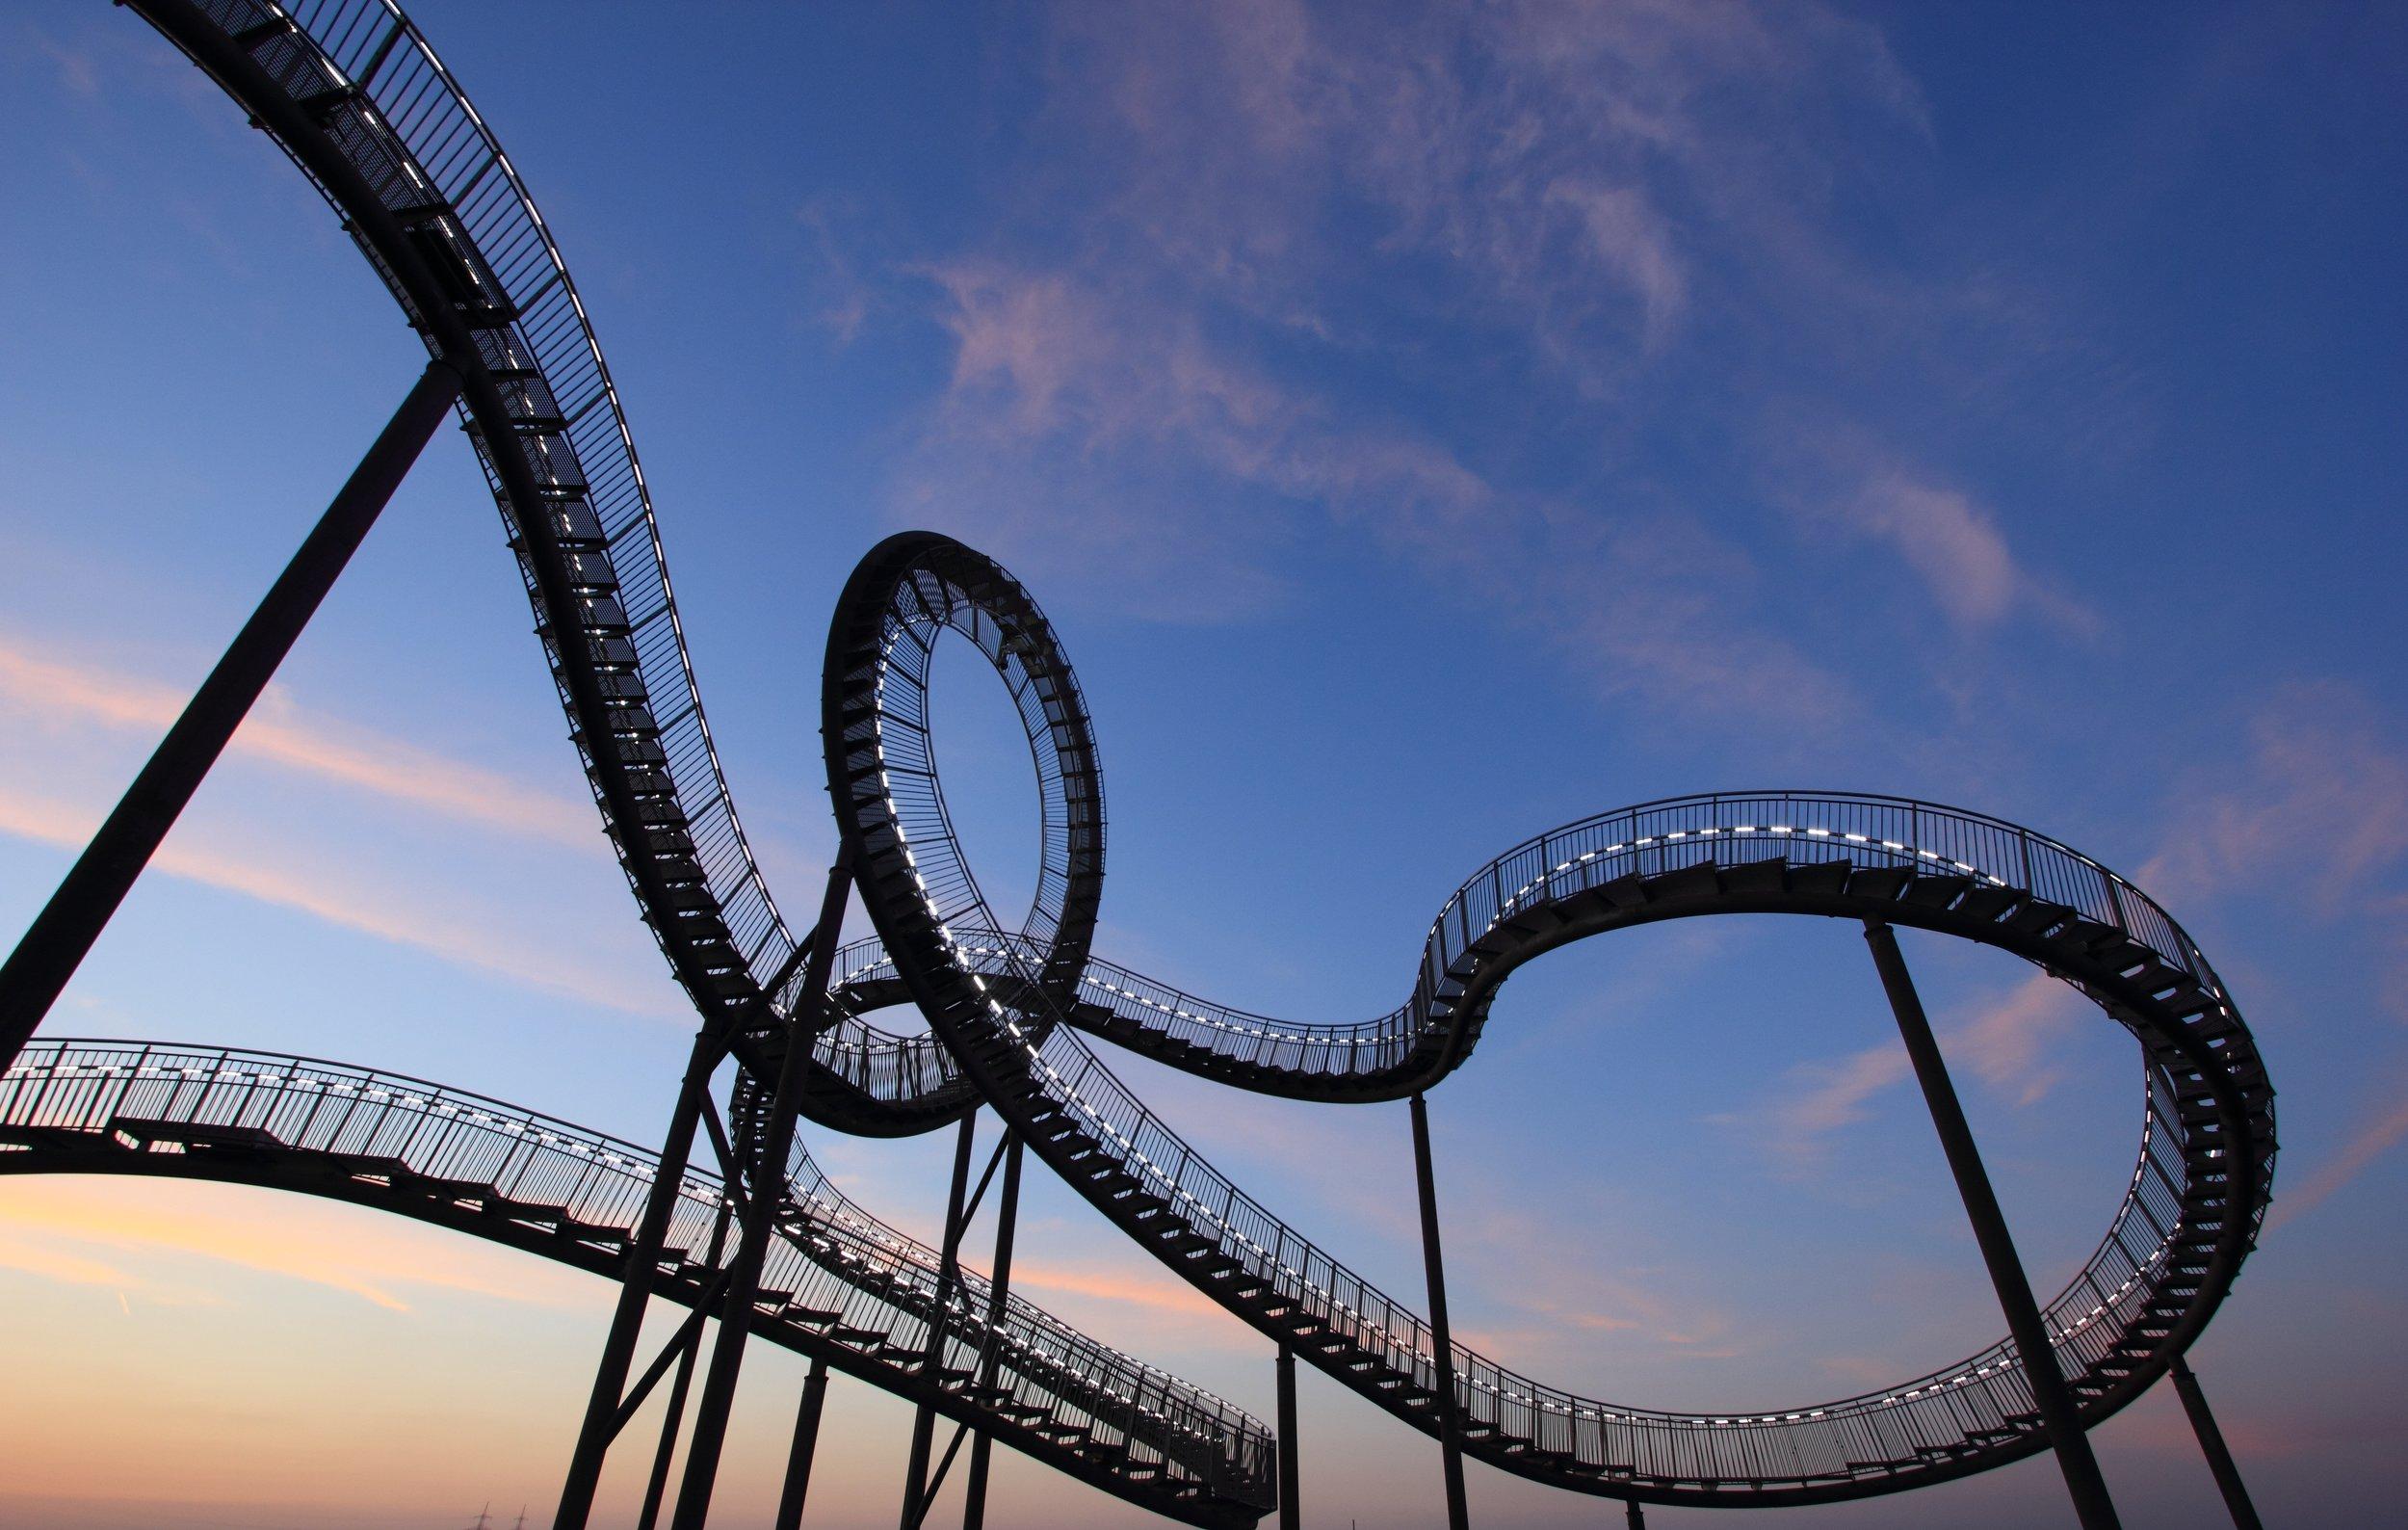 rollercoaster.jpeg